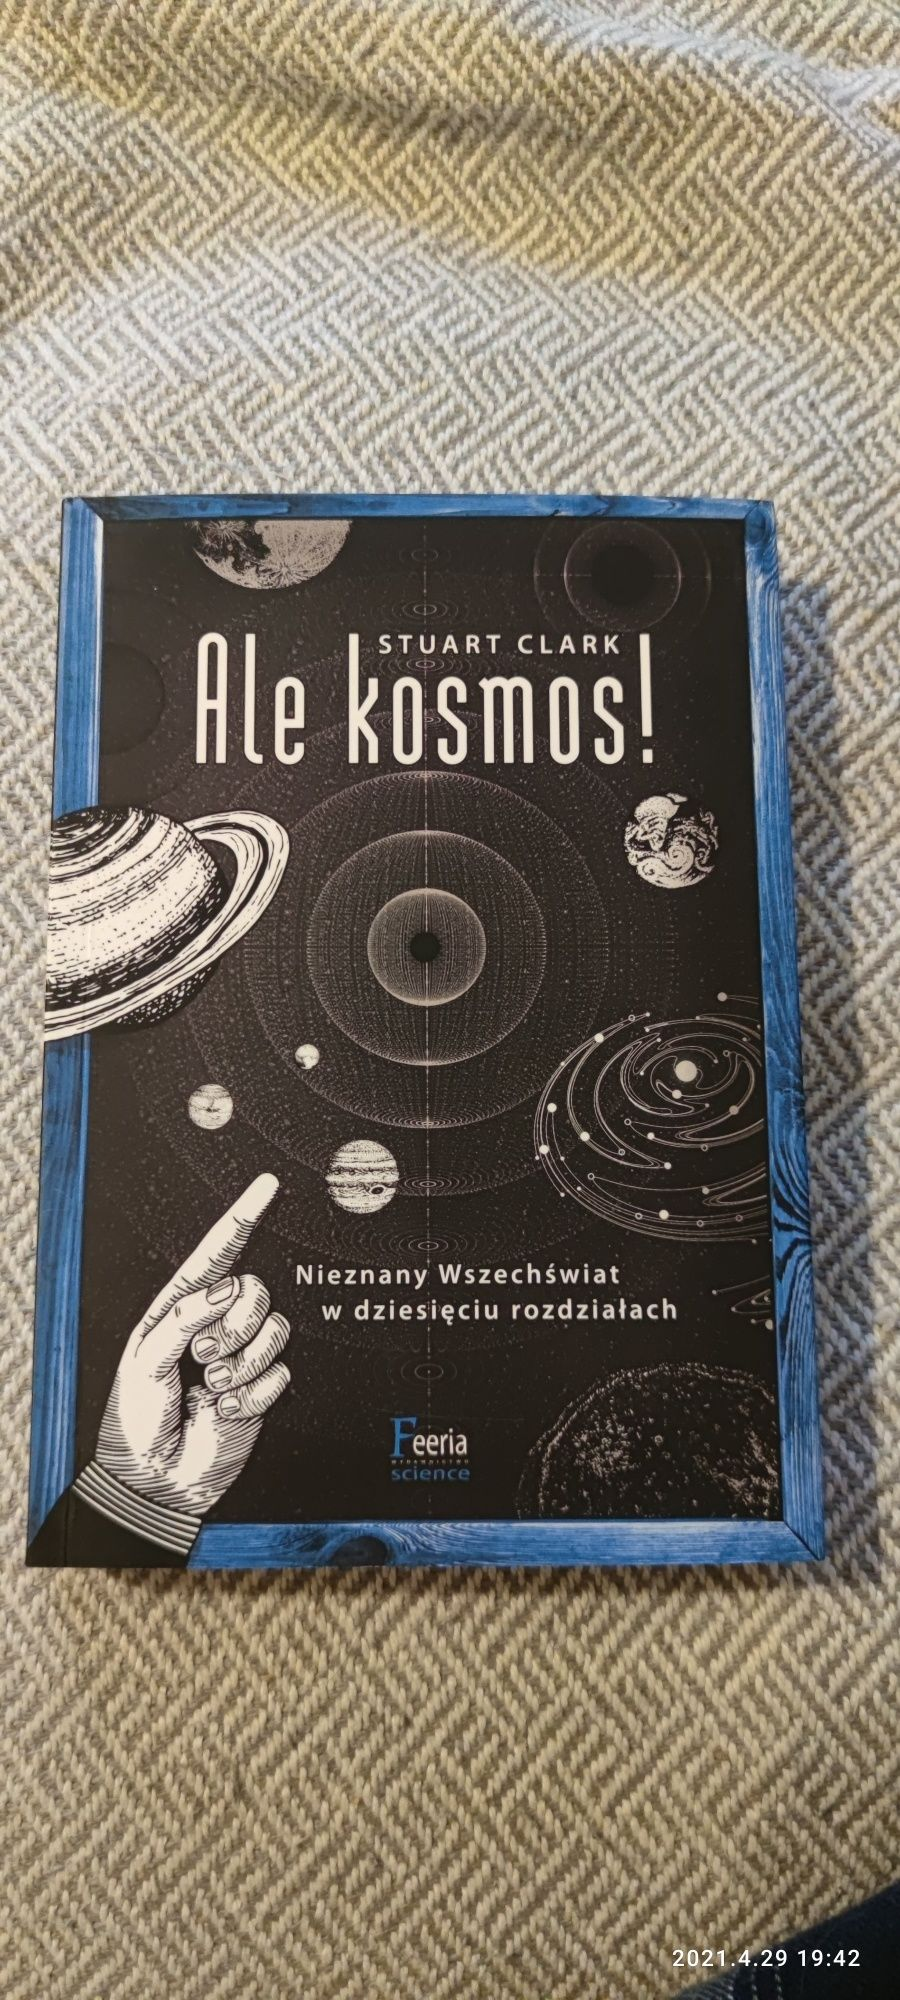 Książka 'Ale kosmos!' Stuart Clark